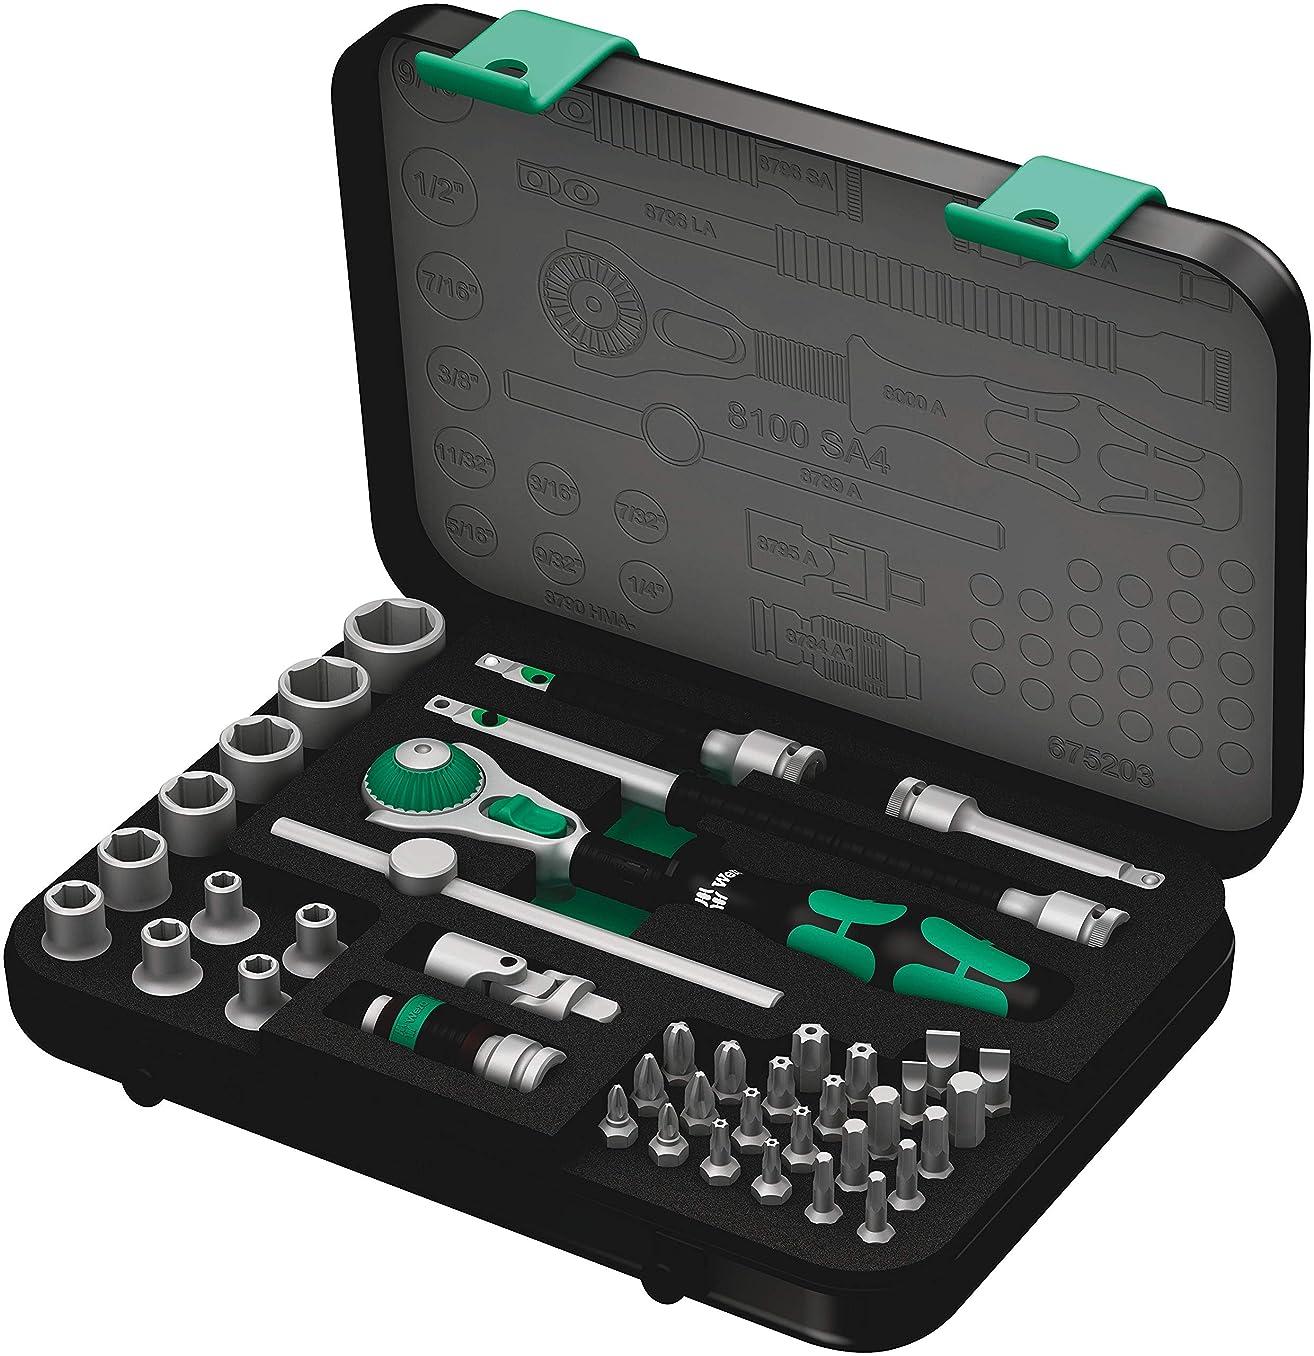 Wera 8100 SA 4 Zyklop Ratchet Set with 1/4